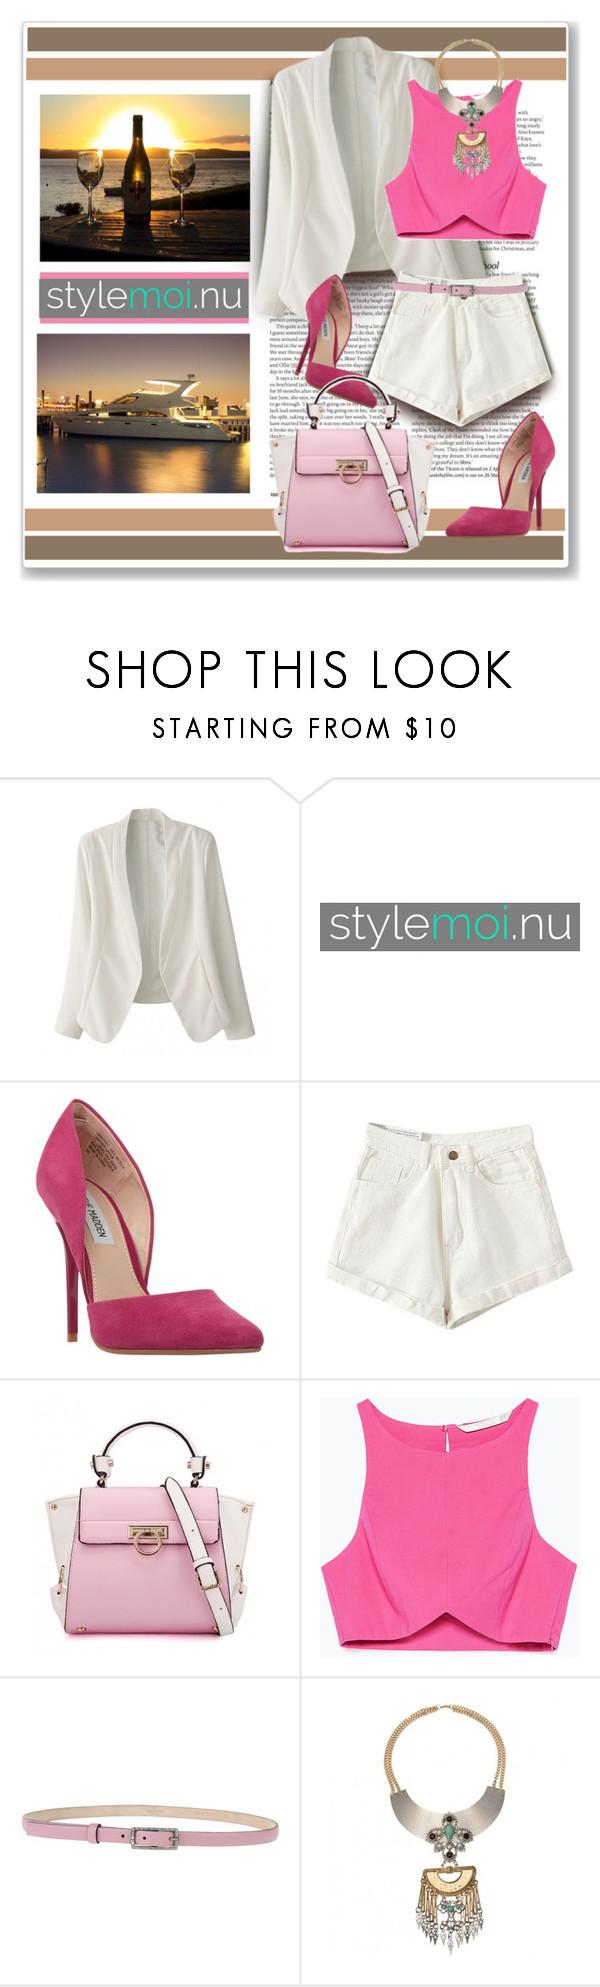 """Stylemoi.nu"" by ruza-b-s ❤ liked on Polyvore featuring ASOS, Steve Madden, Zara, Valentino and stylemoinu"